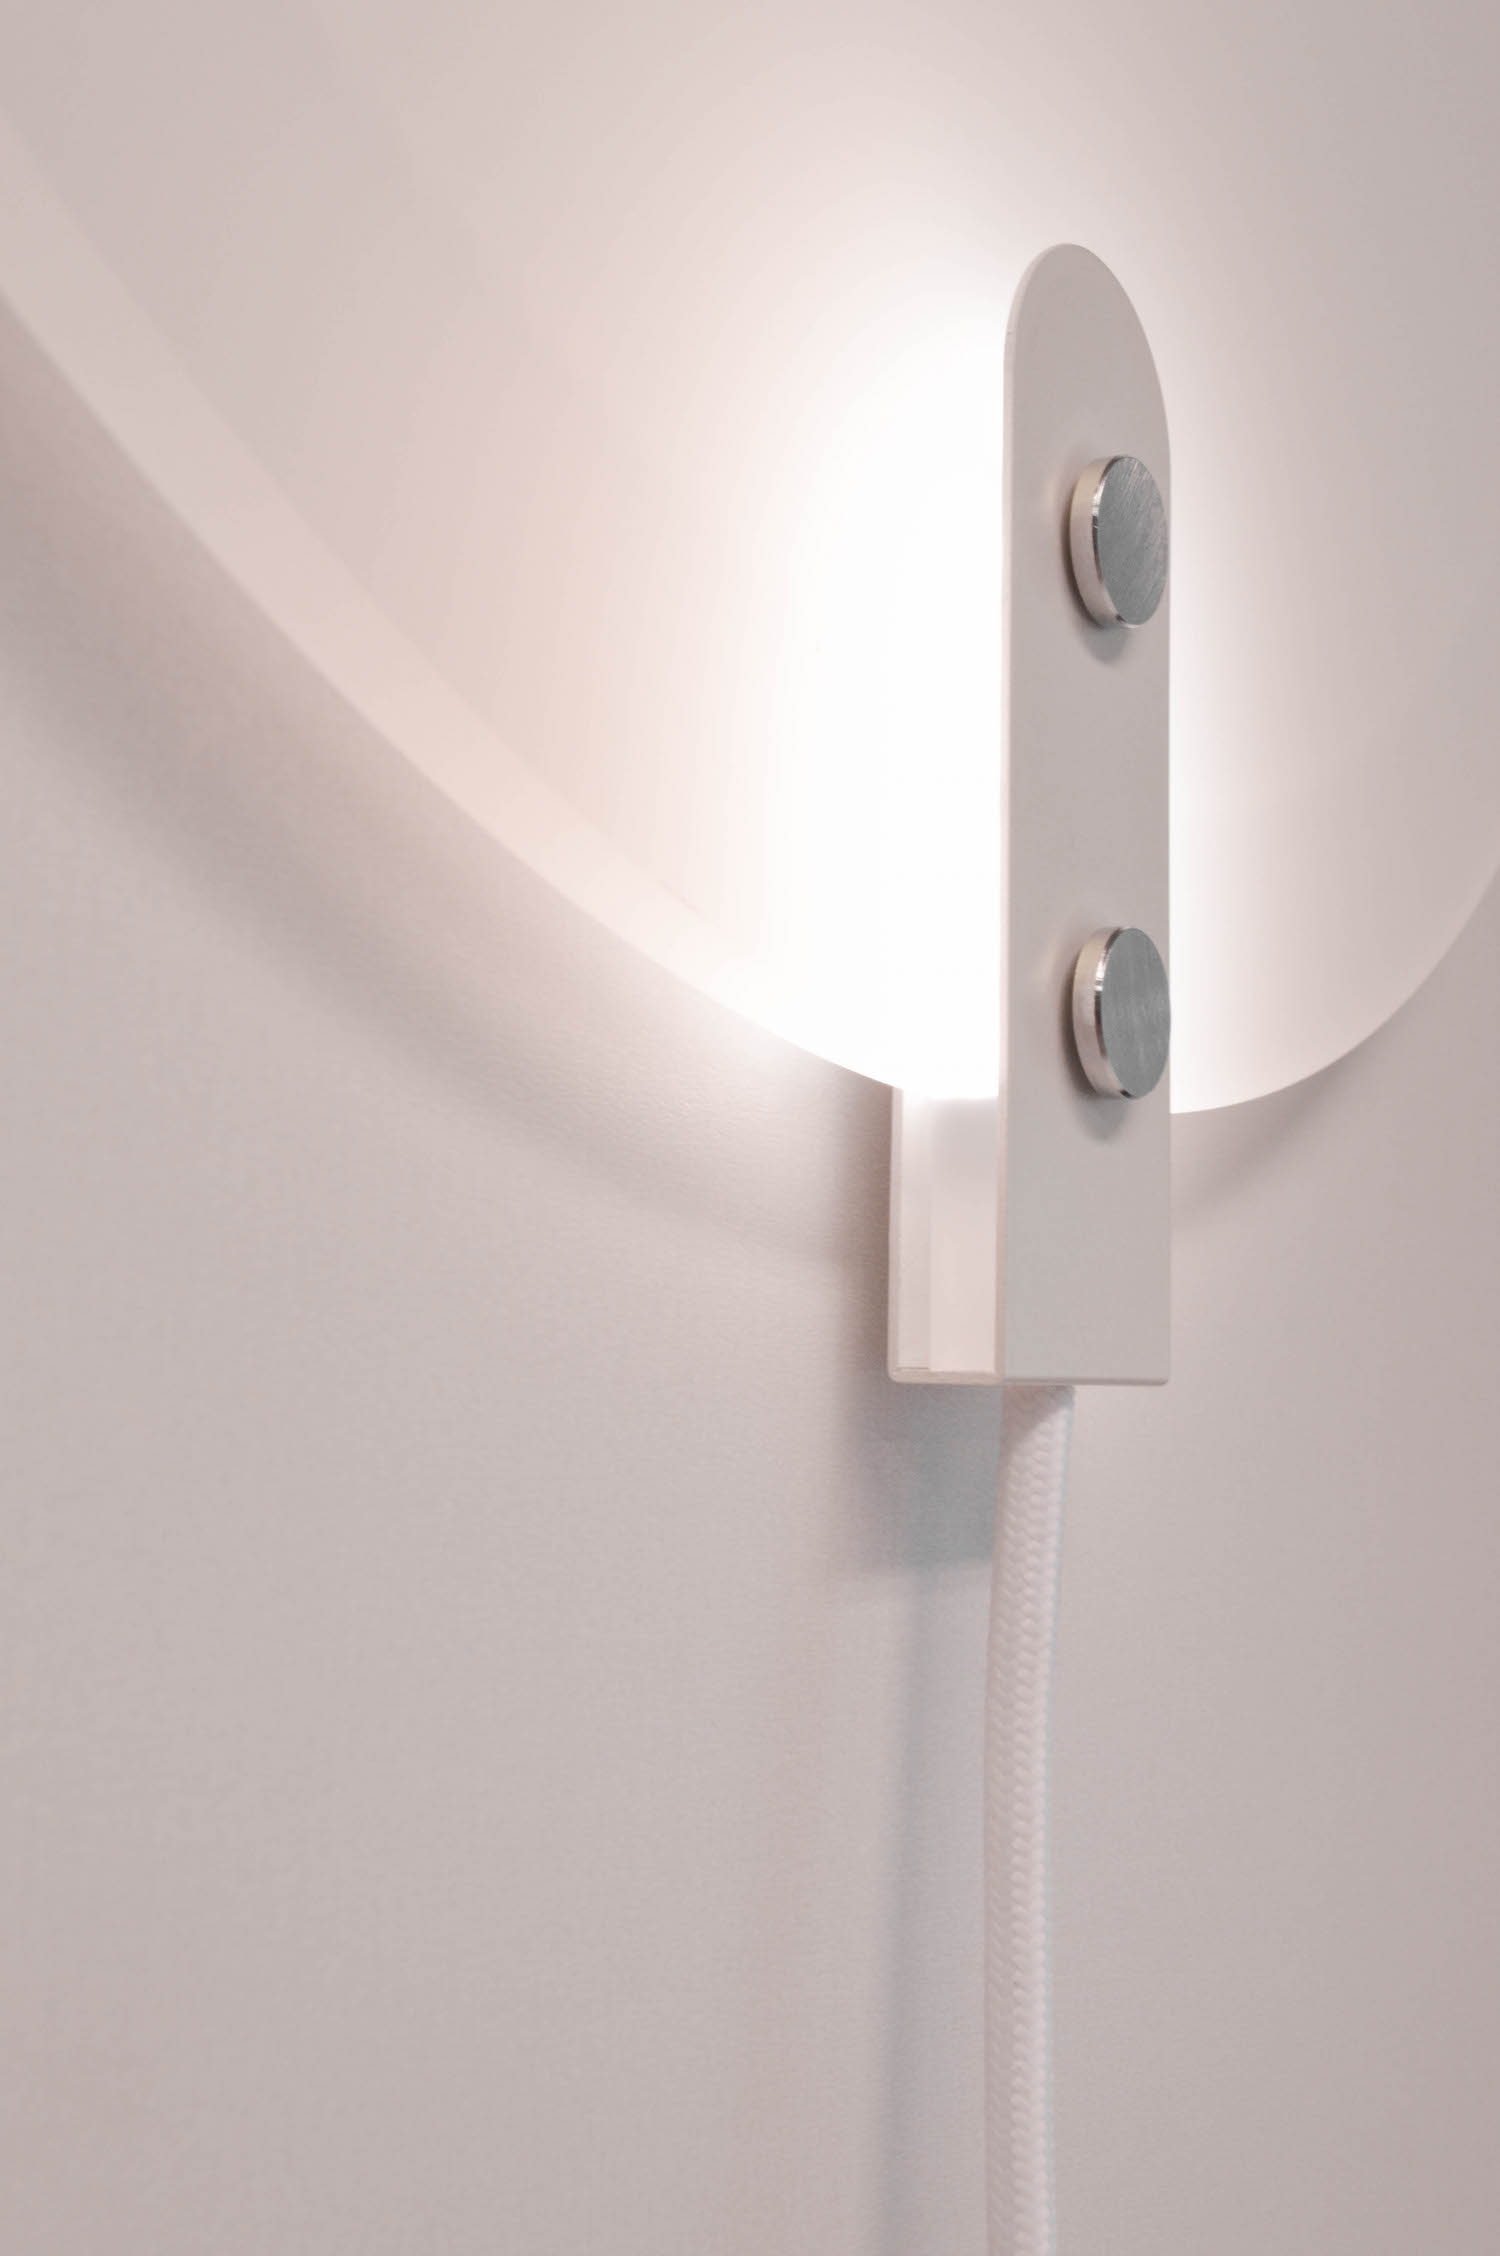 iGNANT_Design_Studio_Fabian_Zeijler Designs_Lamps_Sun_Gazing_02